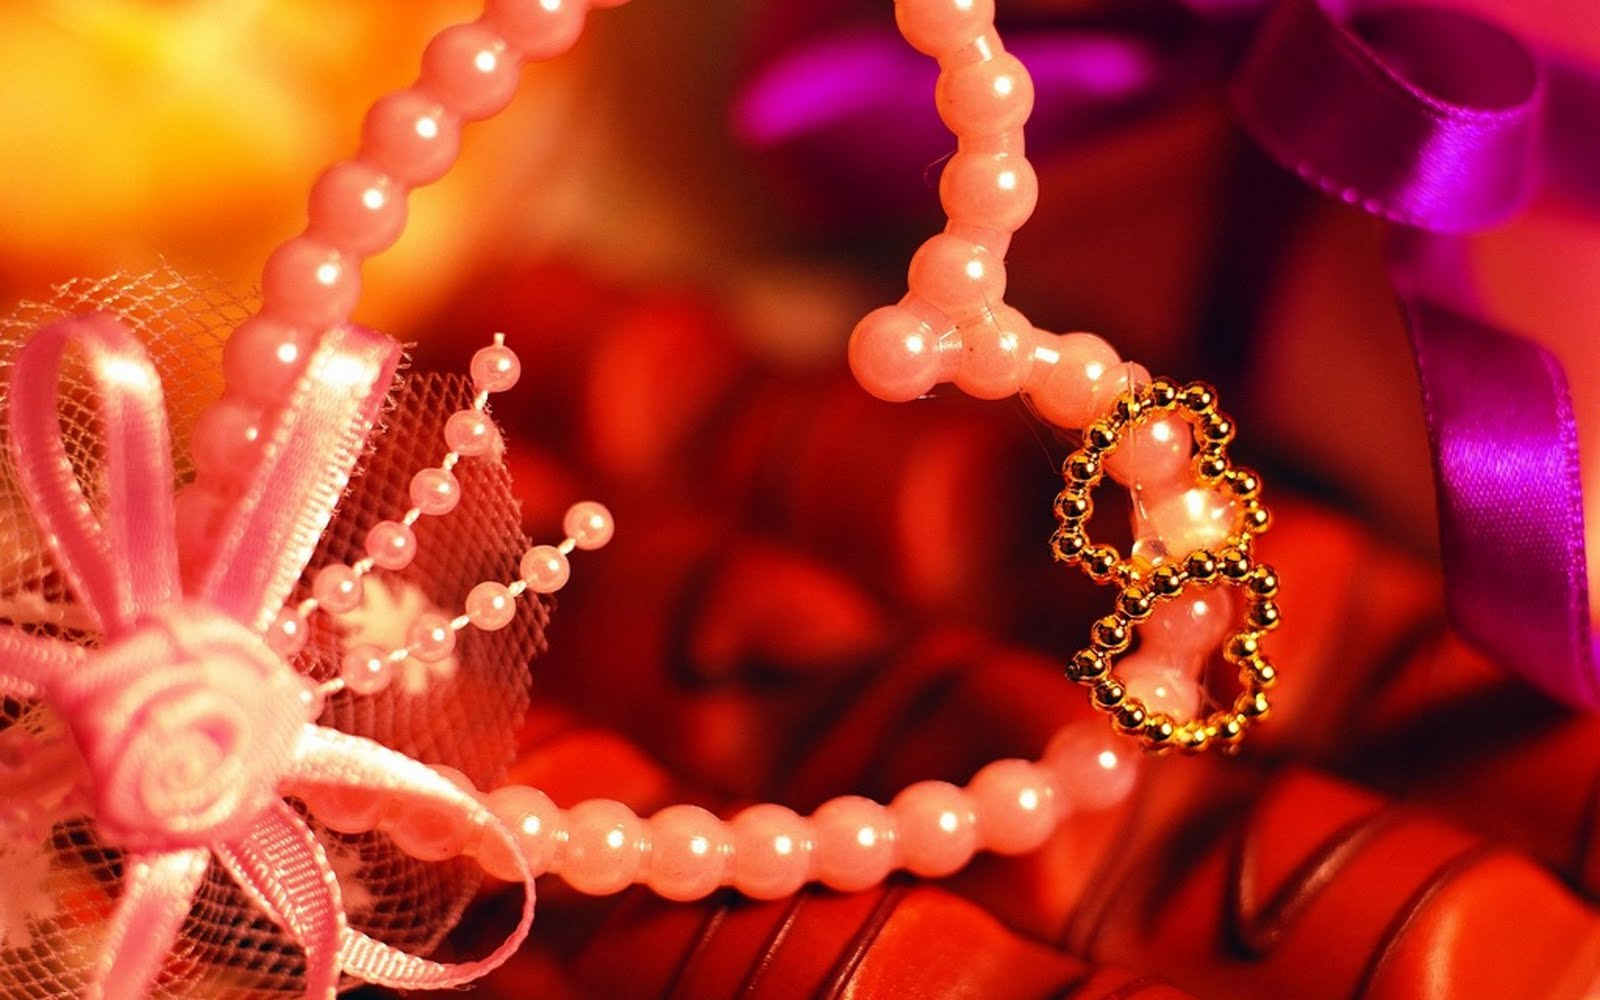 http://4.bp.blogspot.com/_wSeCOlidmxc/THjIqFx1LrI/AAAAAAAAAeU/36wn2hRtdfk/s1600/Love-Jewelry-Wallpaper.jpg